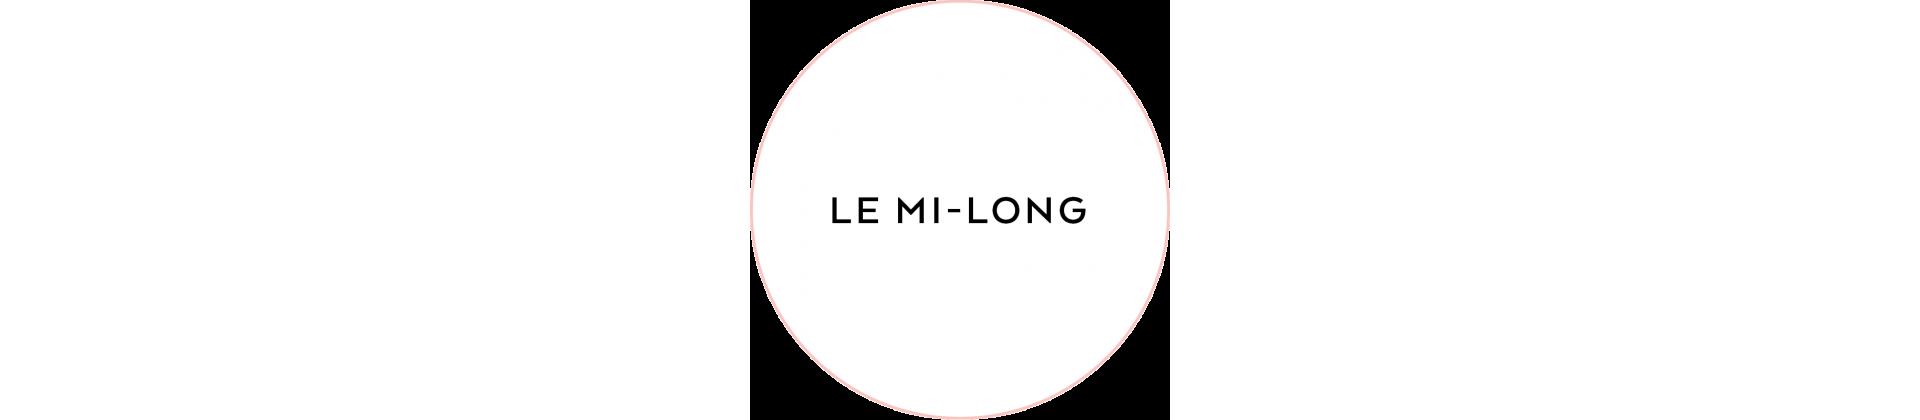 Le Mi-long